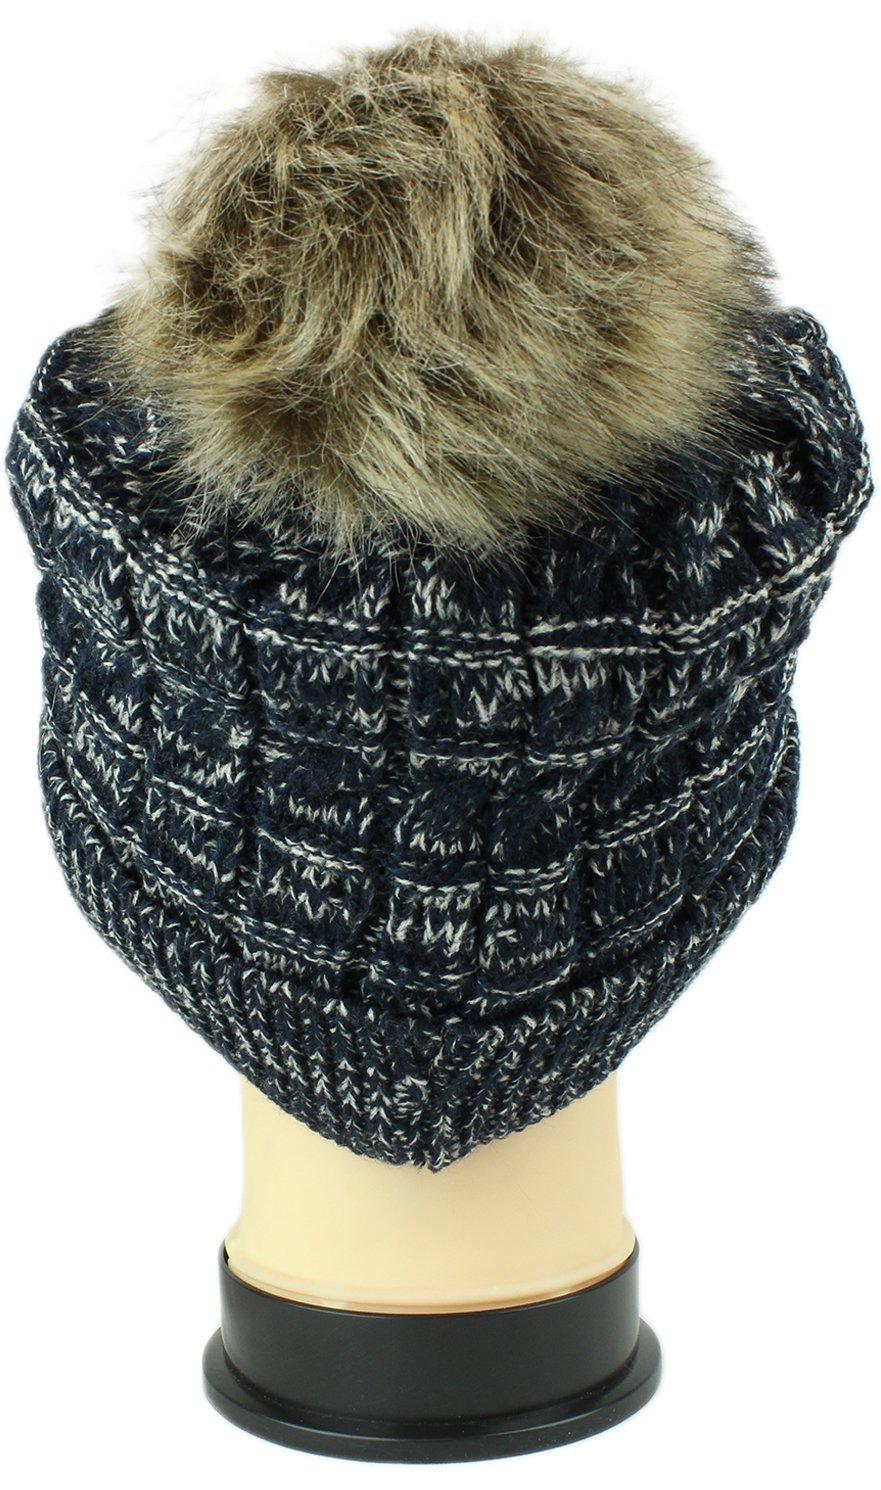 07003759378f02 Amazon.com: bogo Brands: Hats